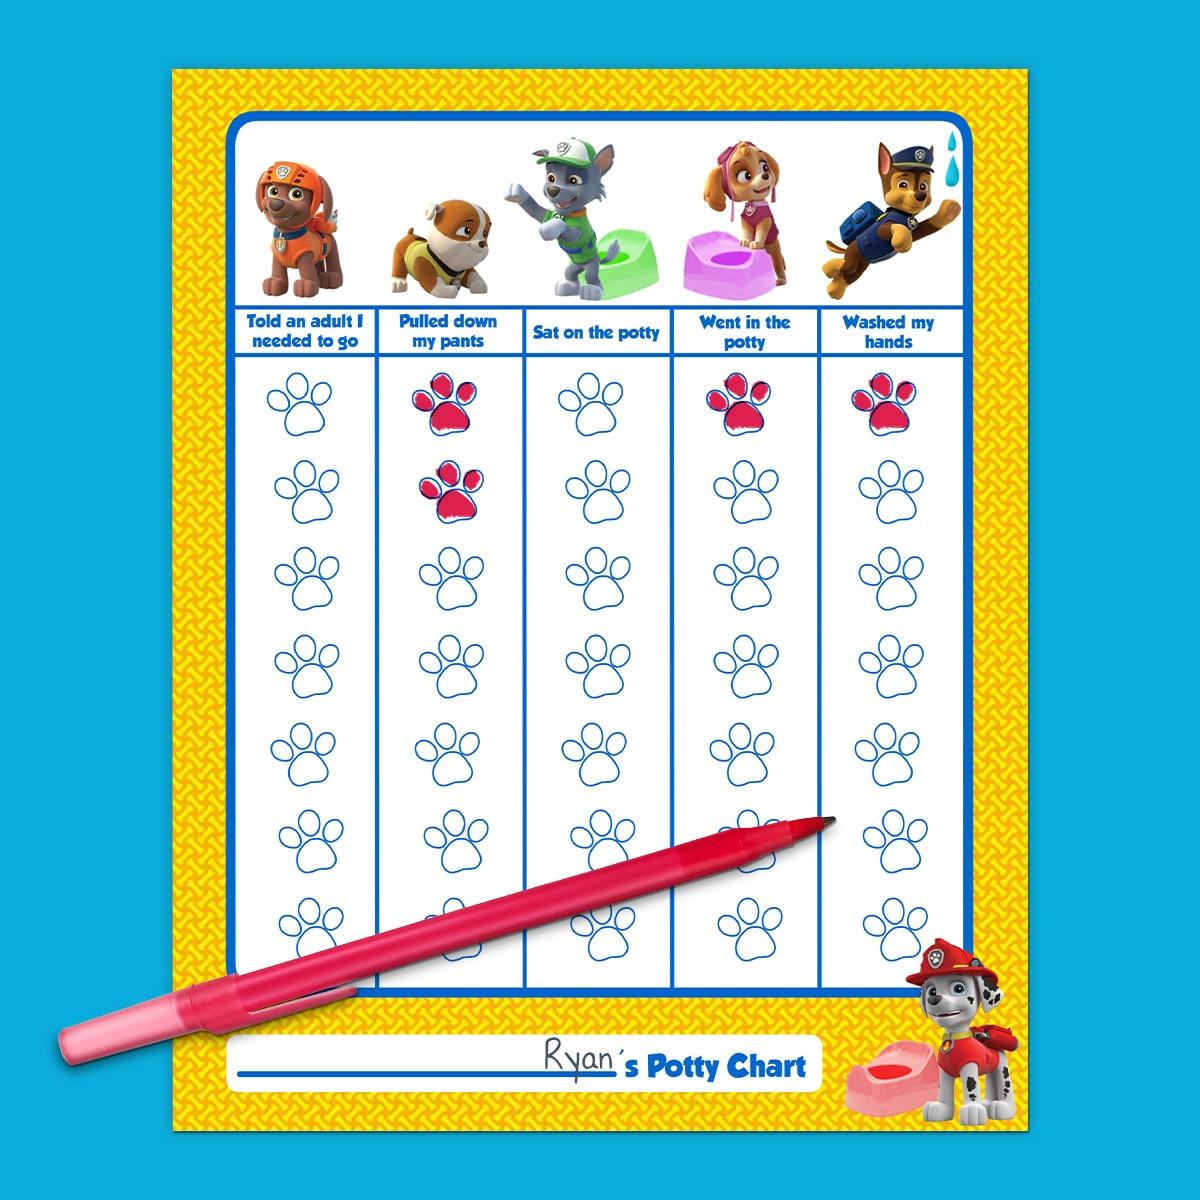 Paw Patrol Potty Training Chart   Nickelodeon Parents - Potty Training Chart Free Printable